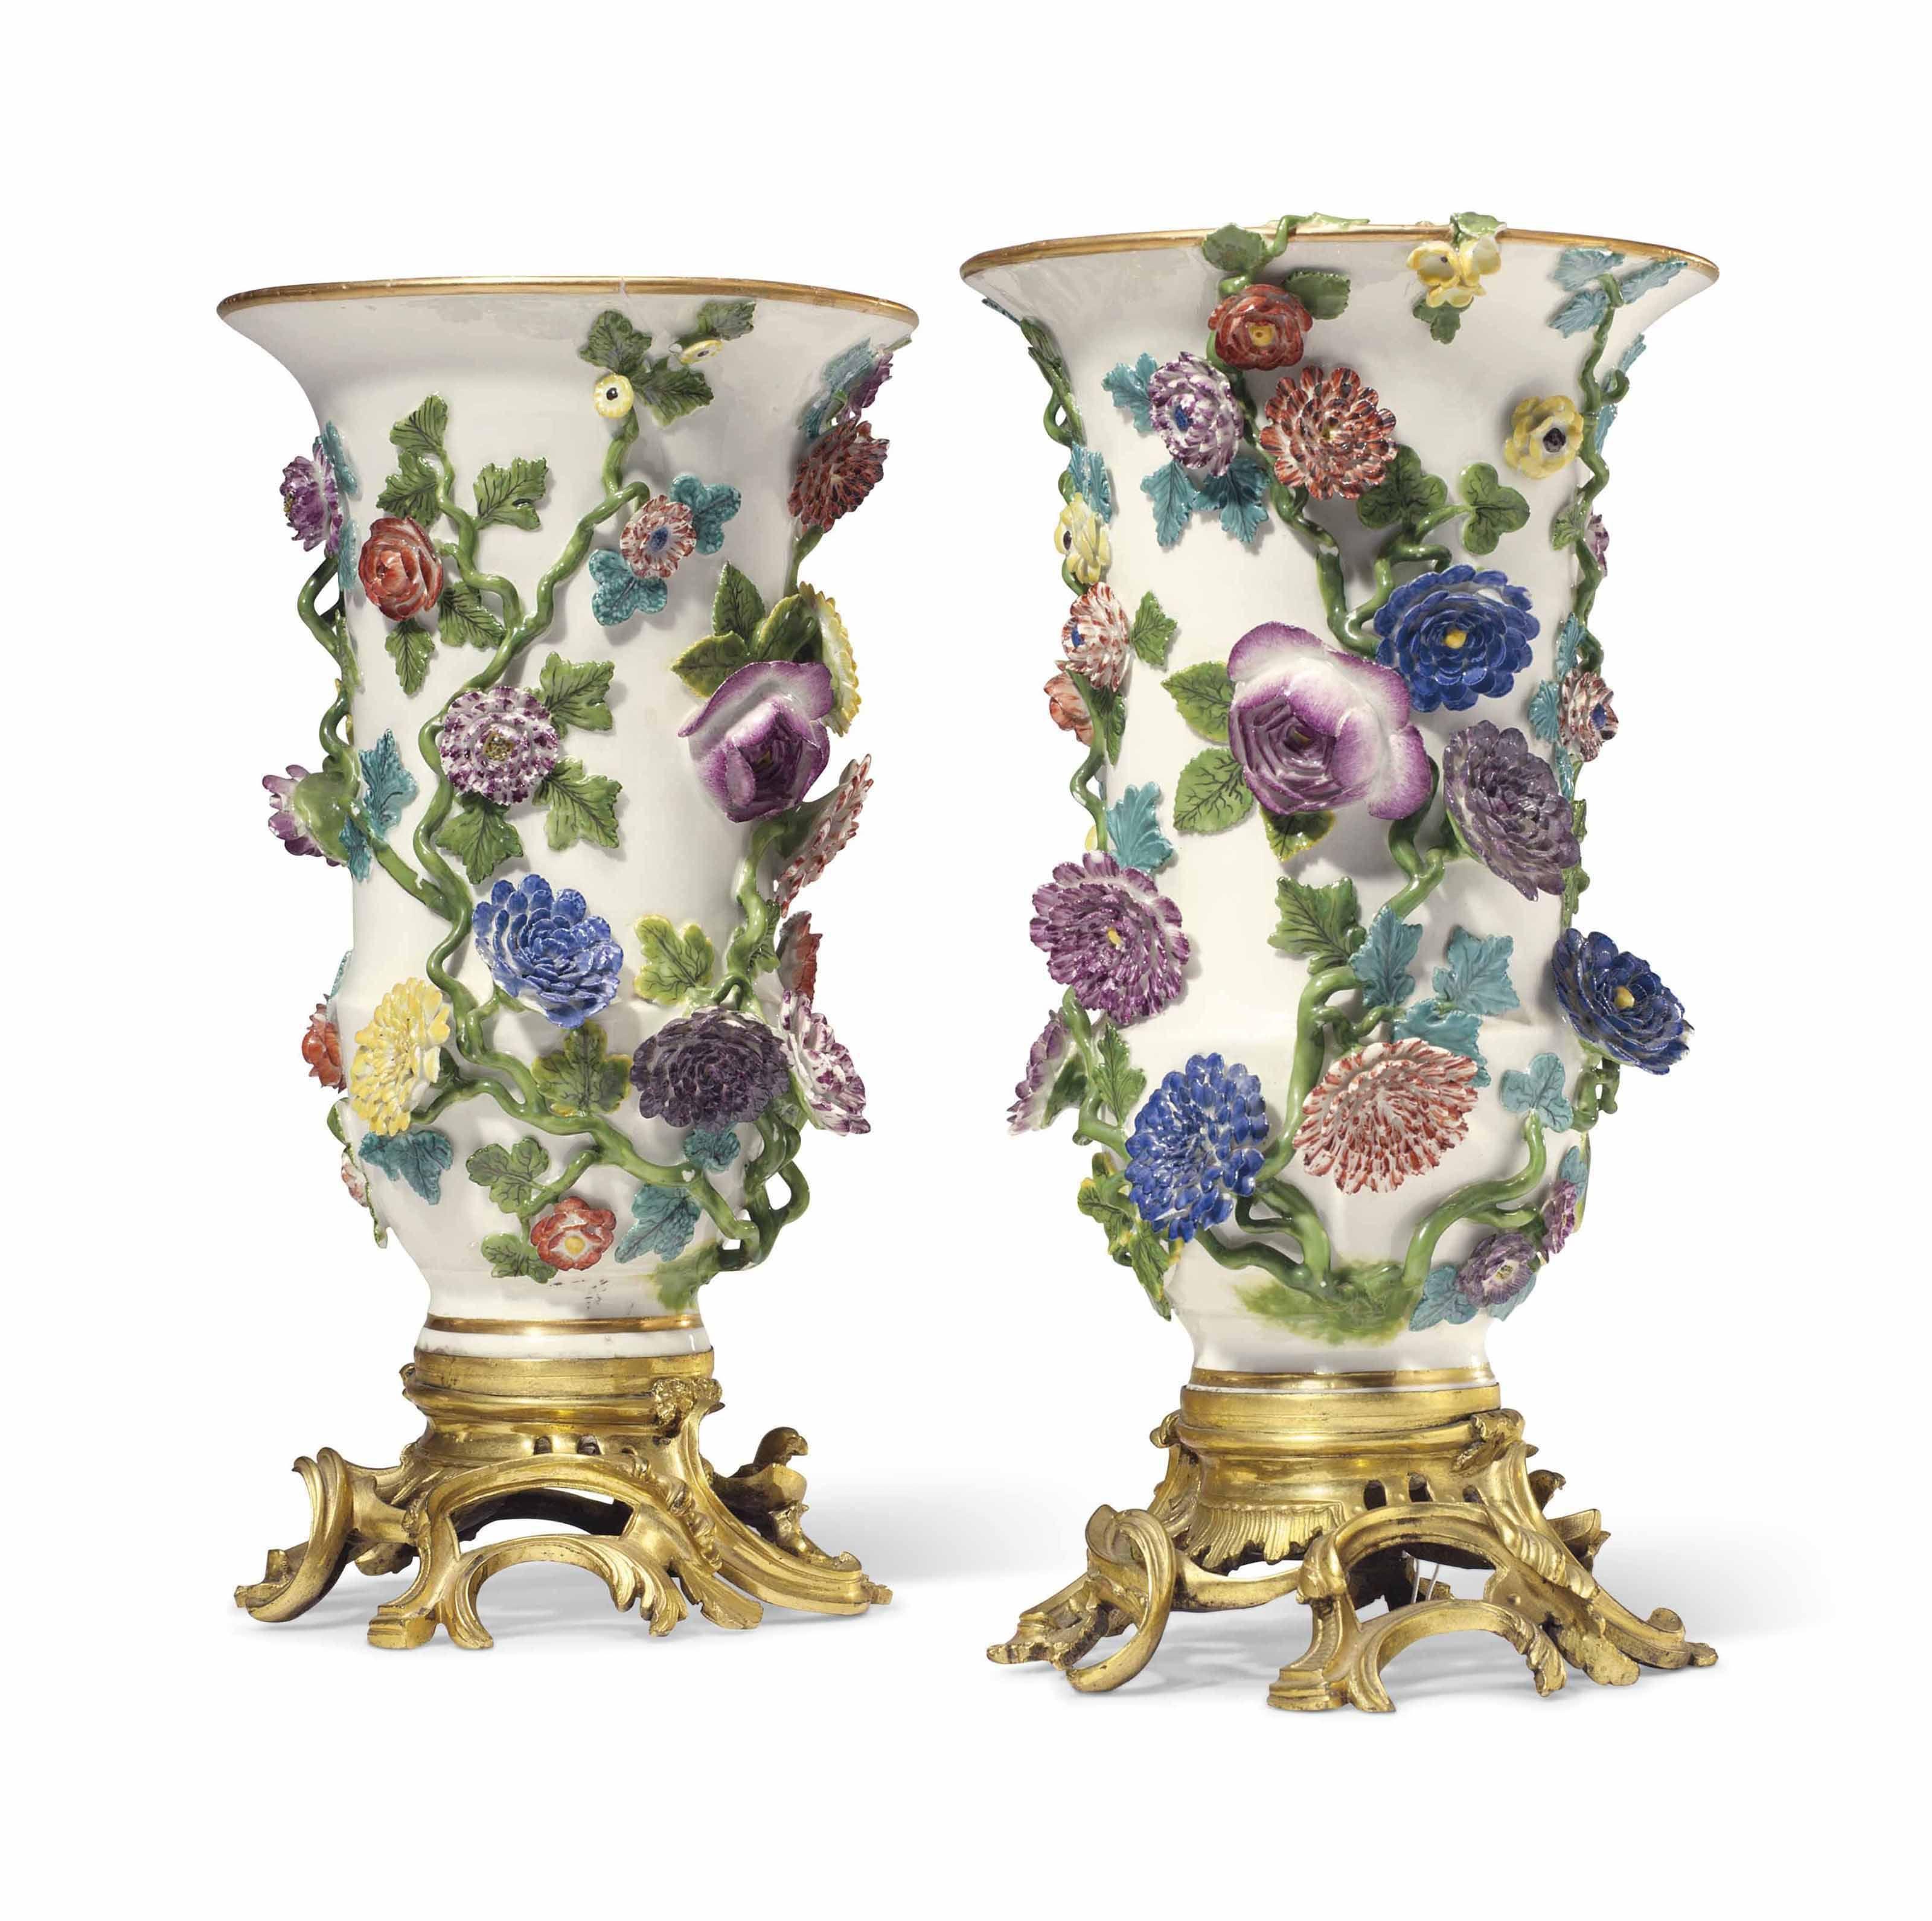 clear gel for flower vases of 23 crystal beaded vase the weekly world for a pair of ormolu mounted meissen porcelain flower encrusted vases